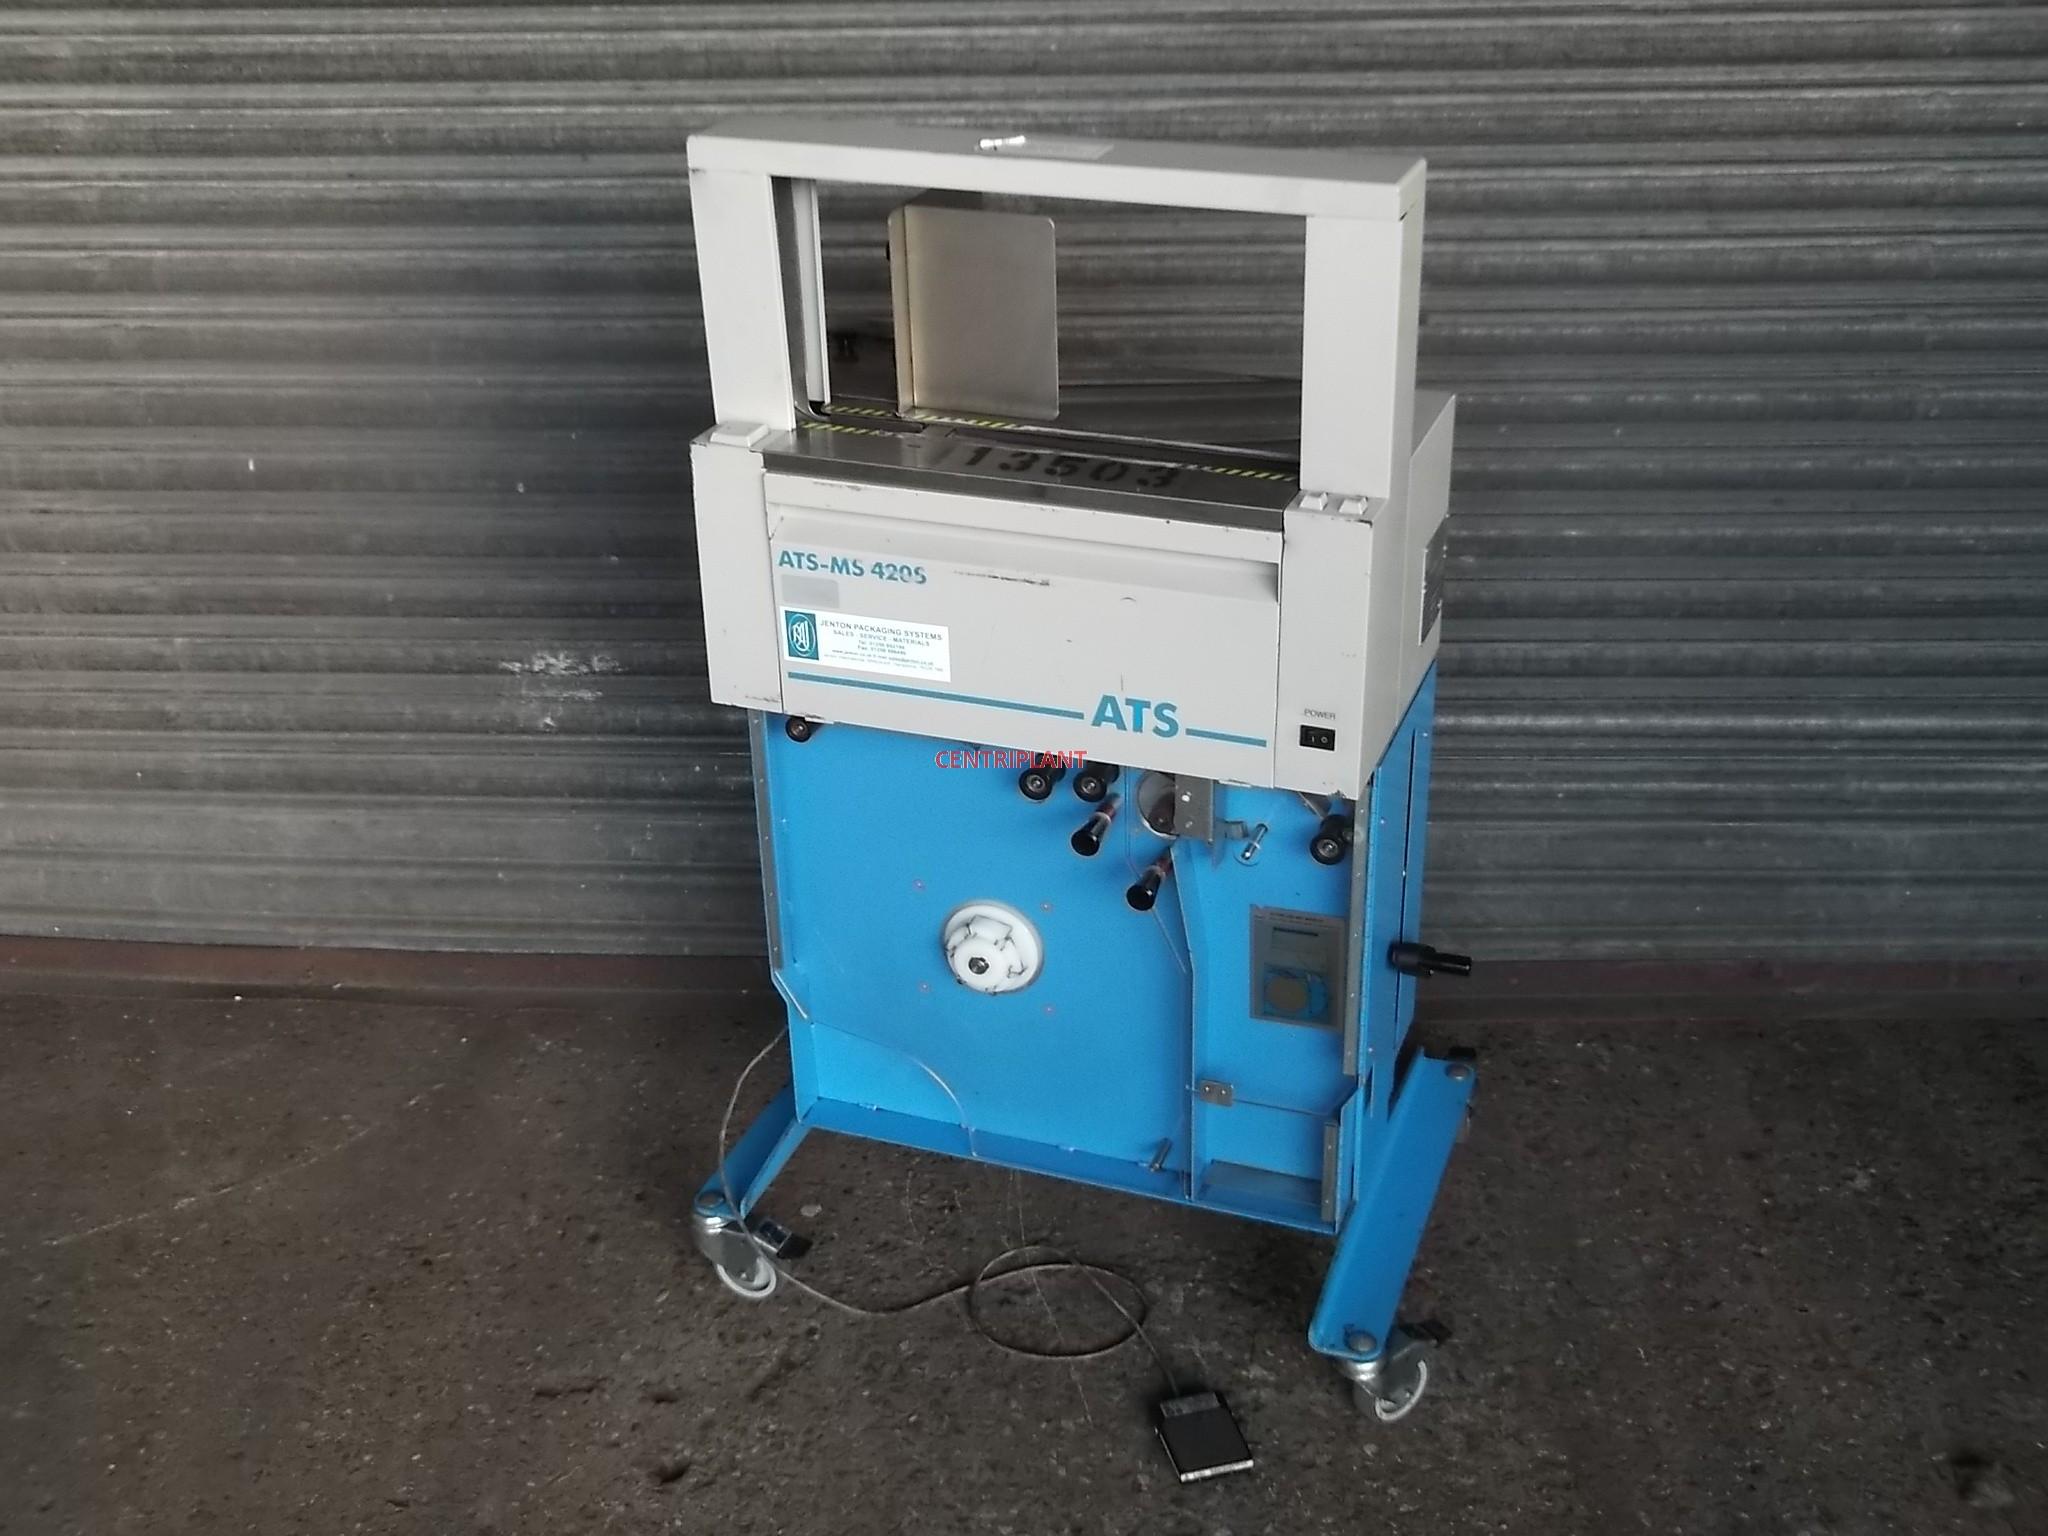 13503 - ATS BANDING MACHINE, 400 MM WIDE X 200 MM HIGH